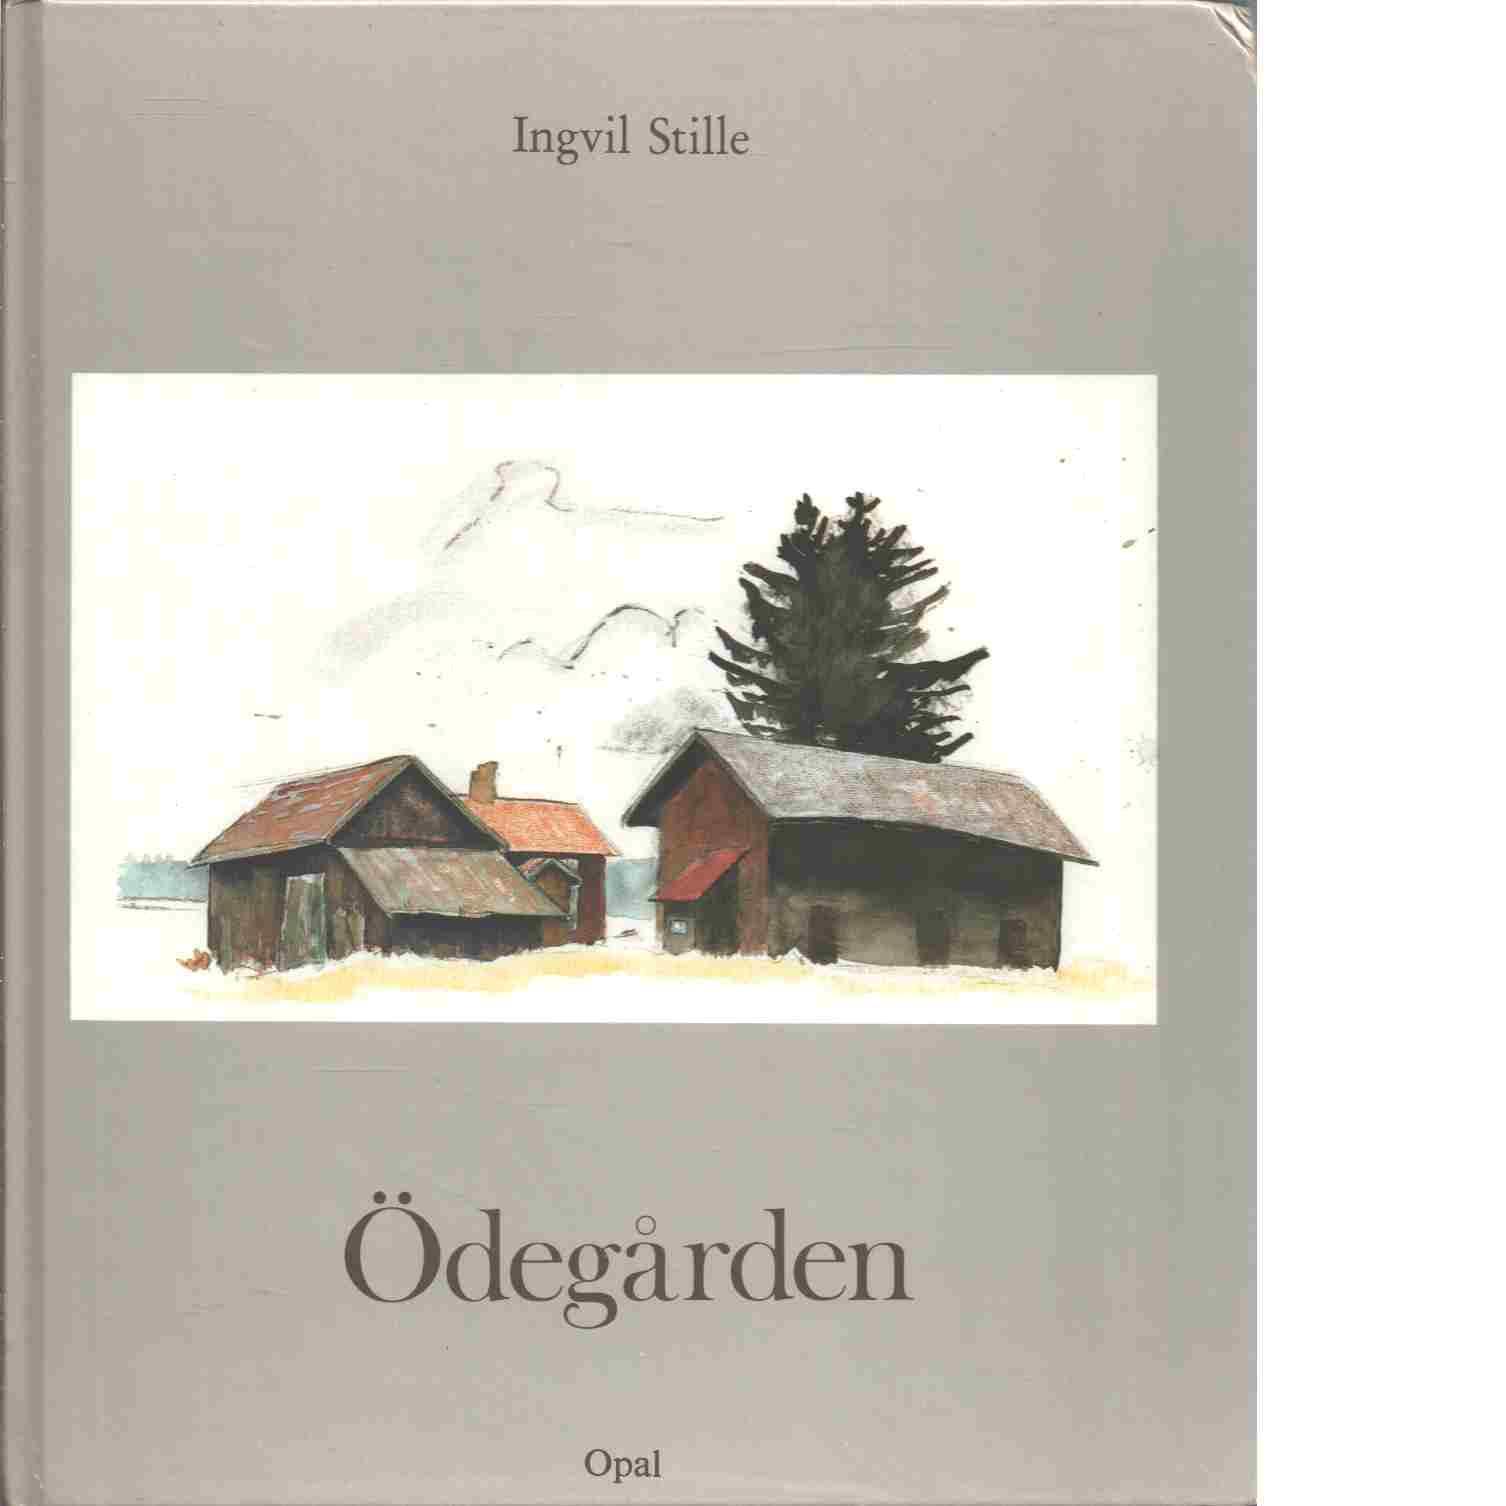 Ödegården - Stille, Ingvil